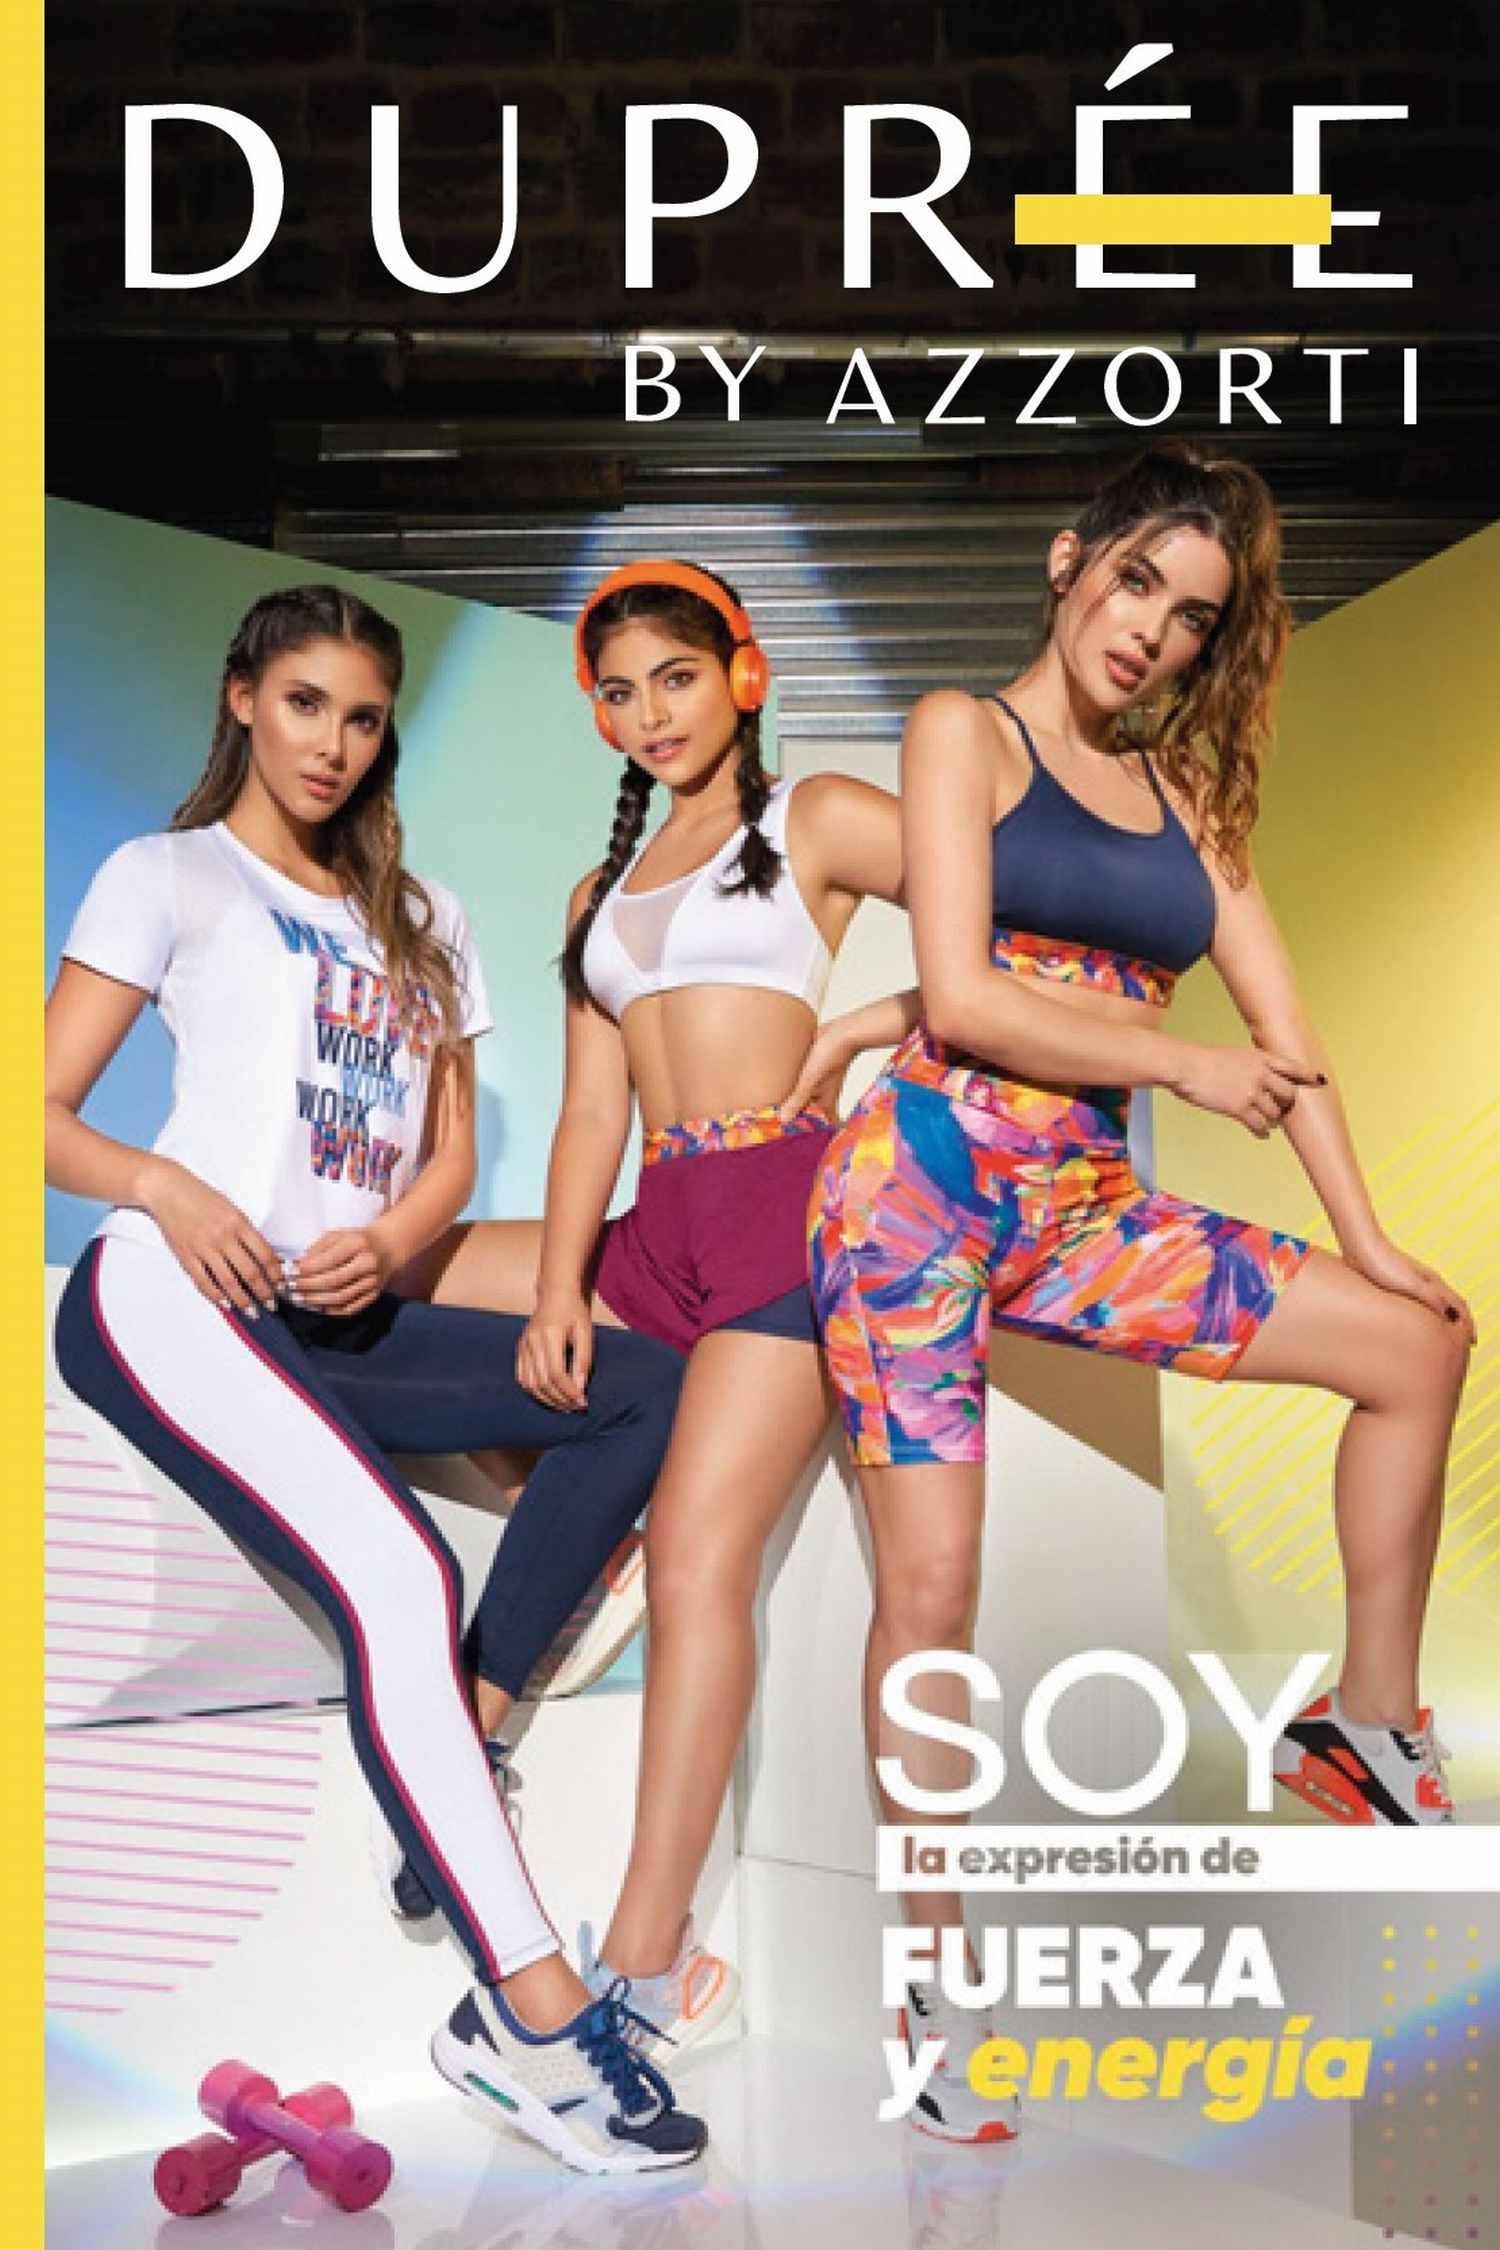 Catalogo Dupree Campaña 12 2021 Colombia